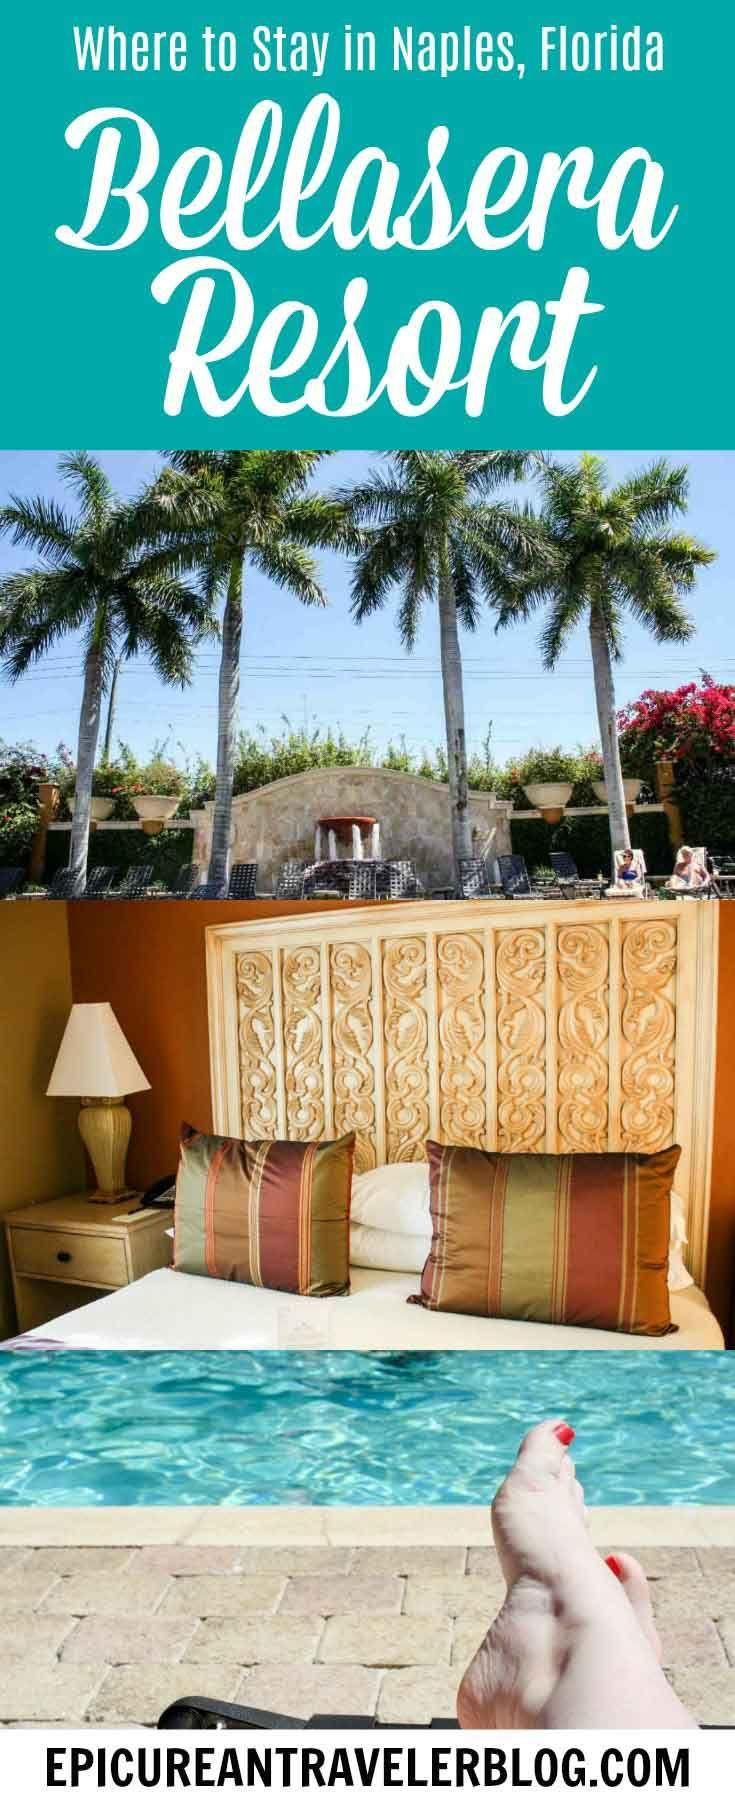 Hotel review bellasera resort in naples florida